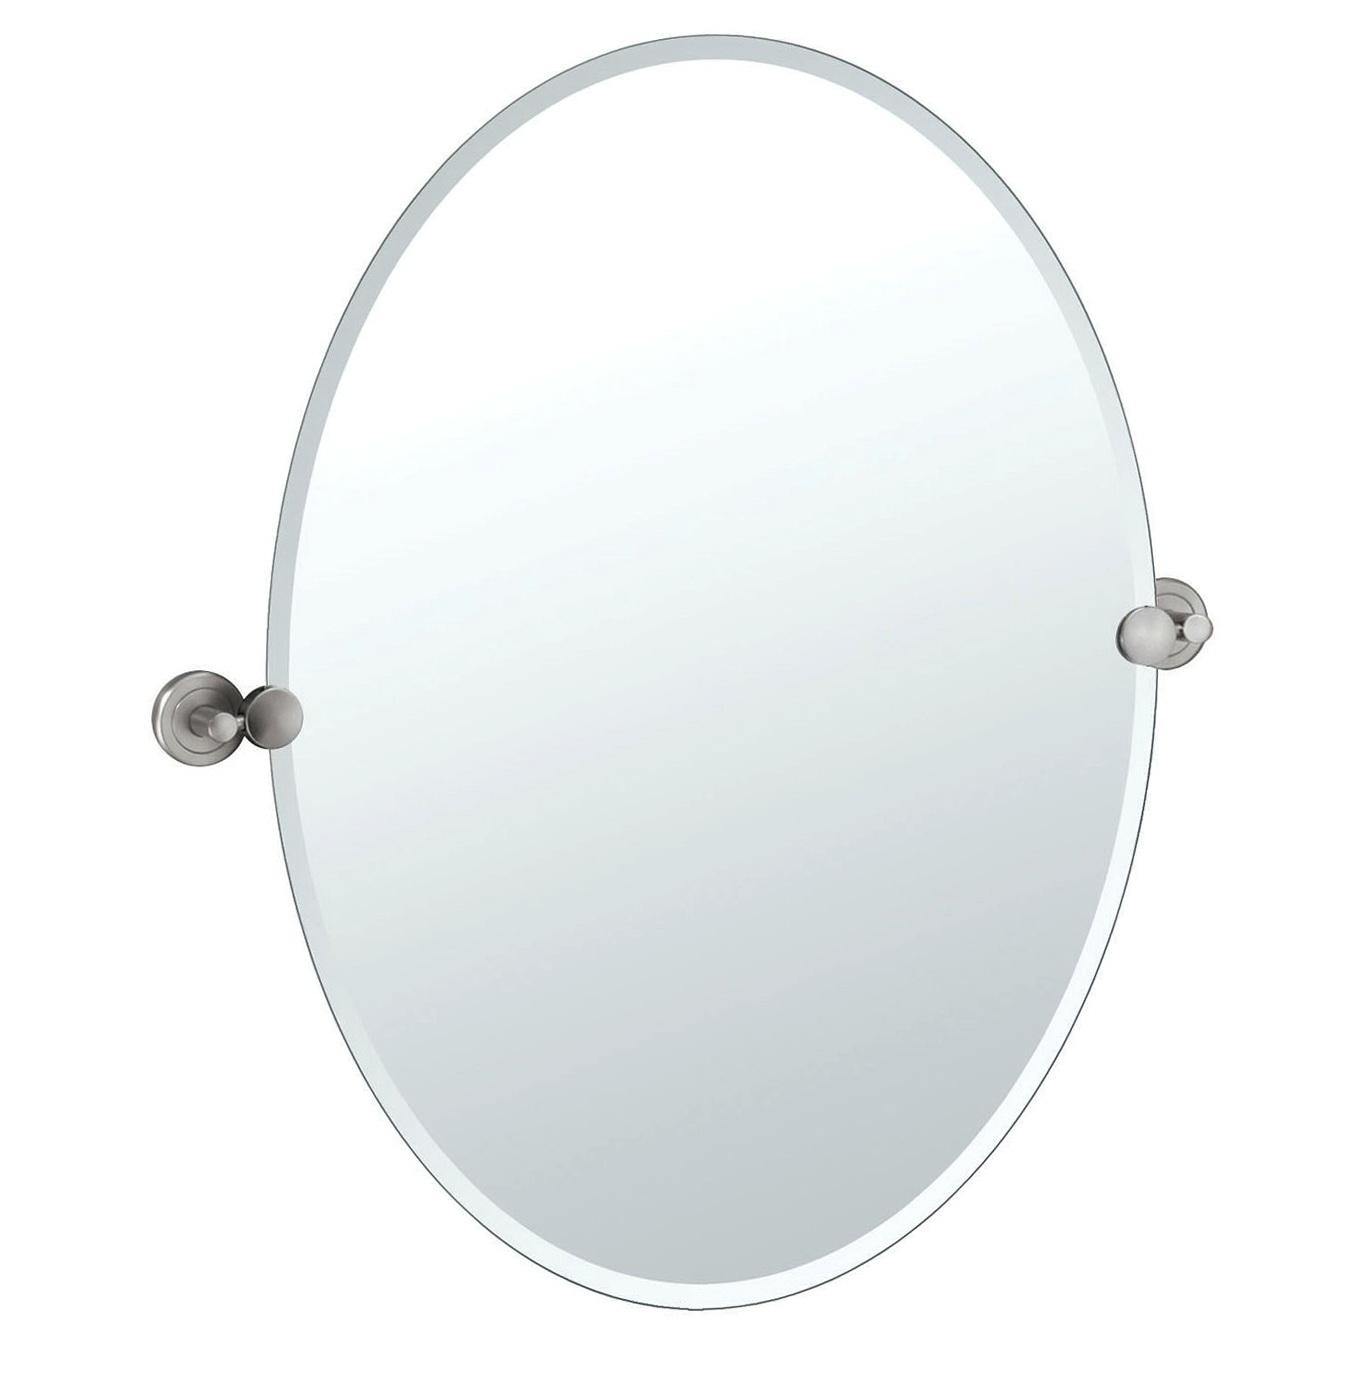 Oval Bathroom Mirrors Lowes